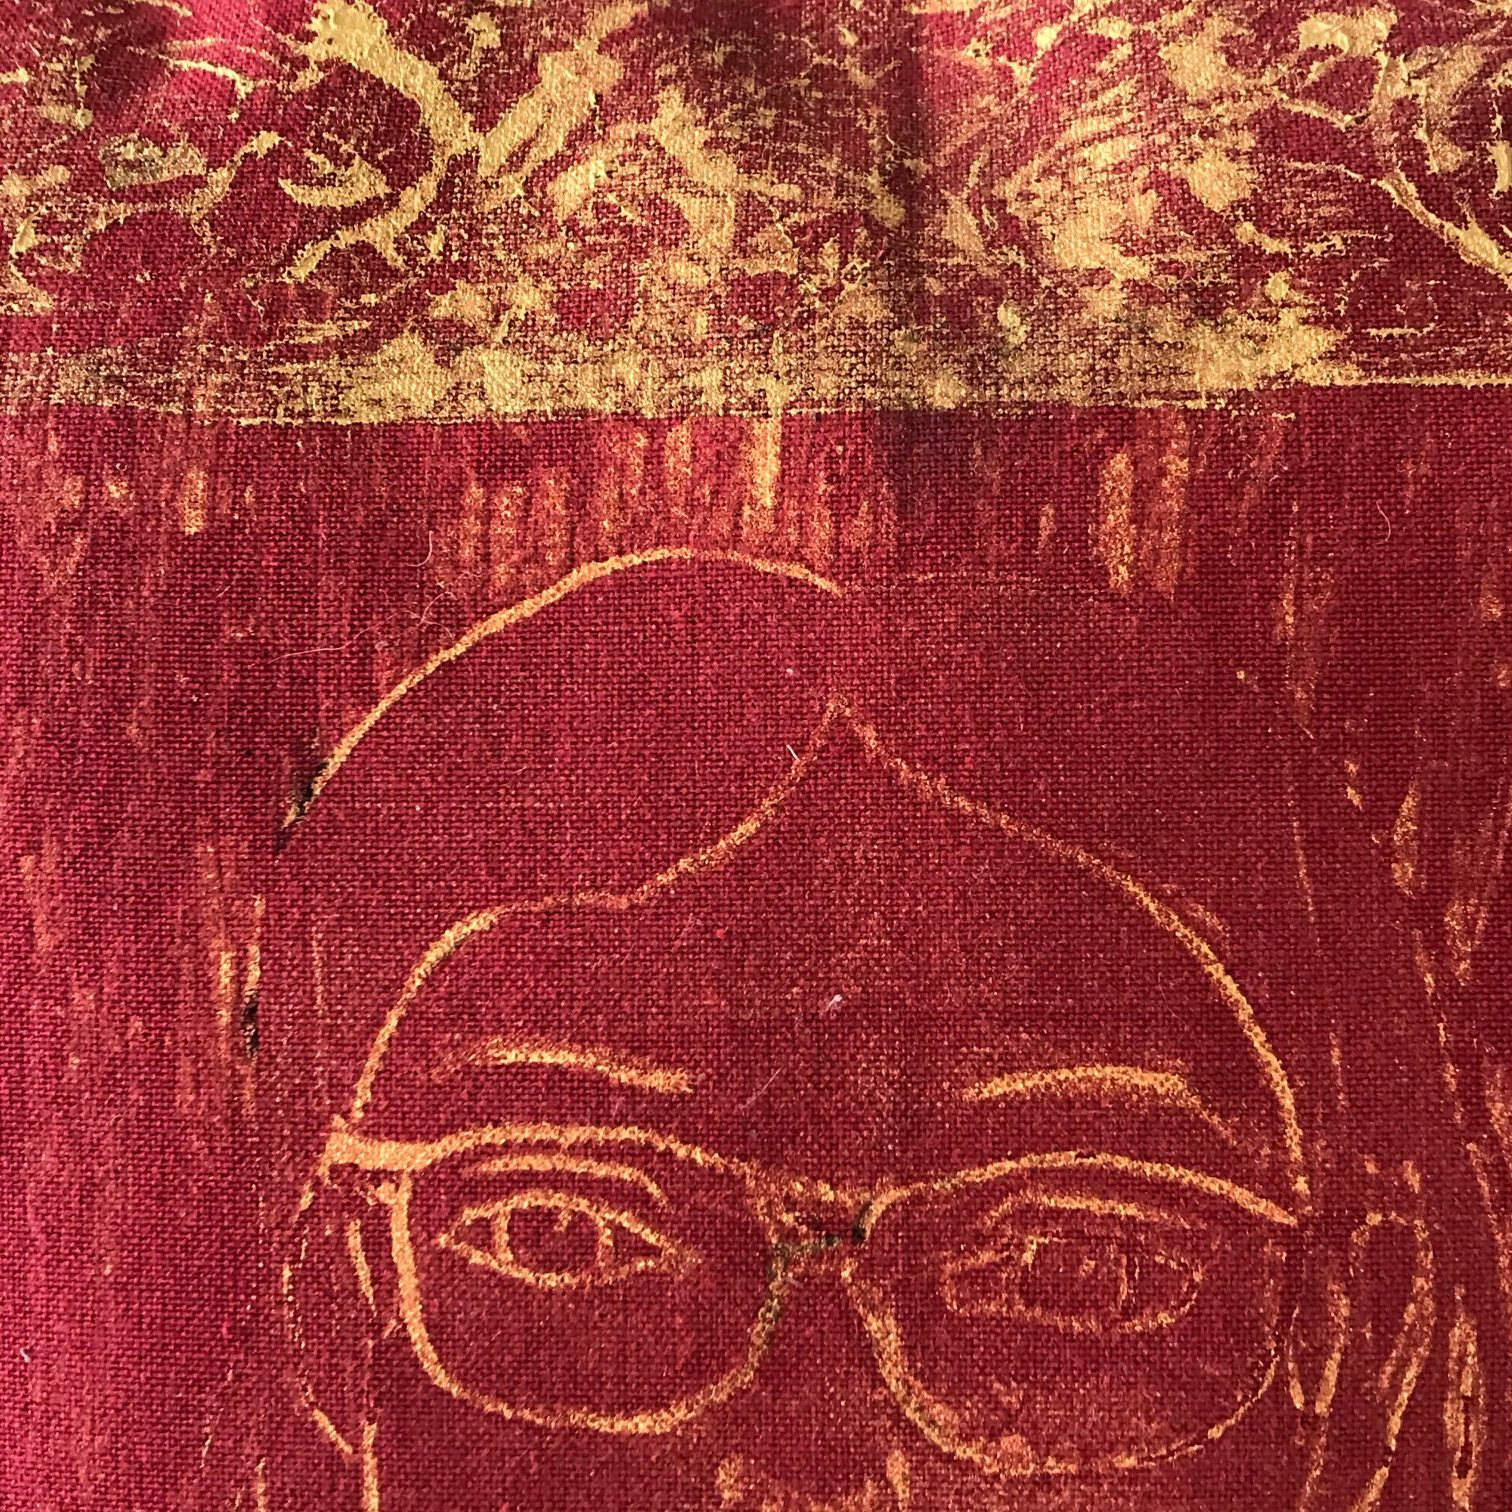 Portrait in Gold (detail)